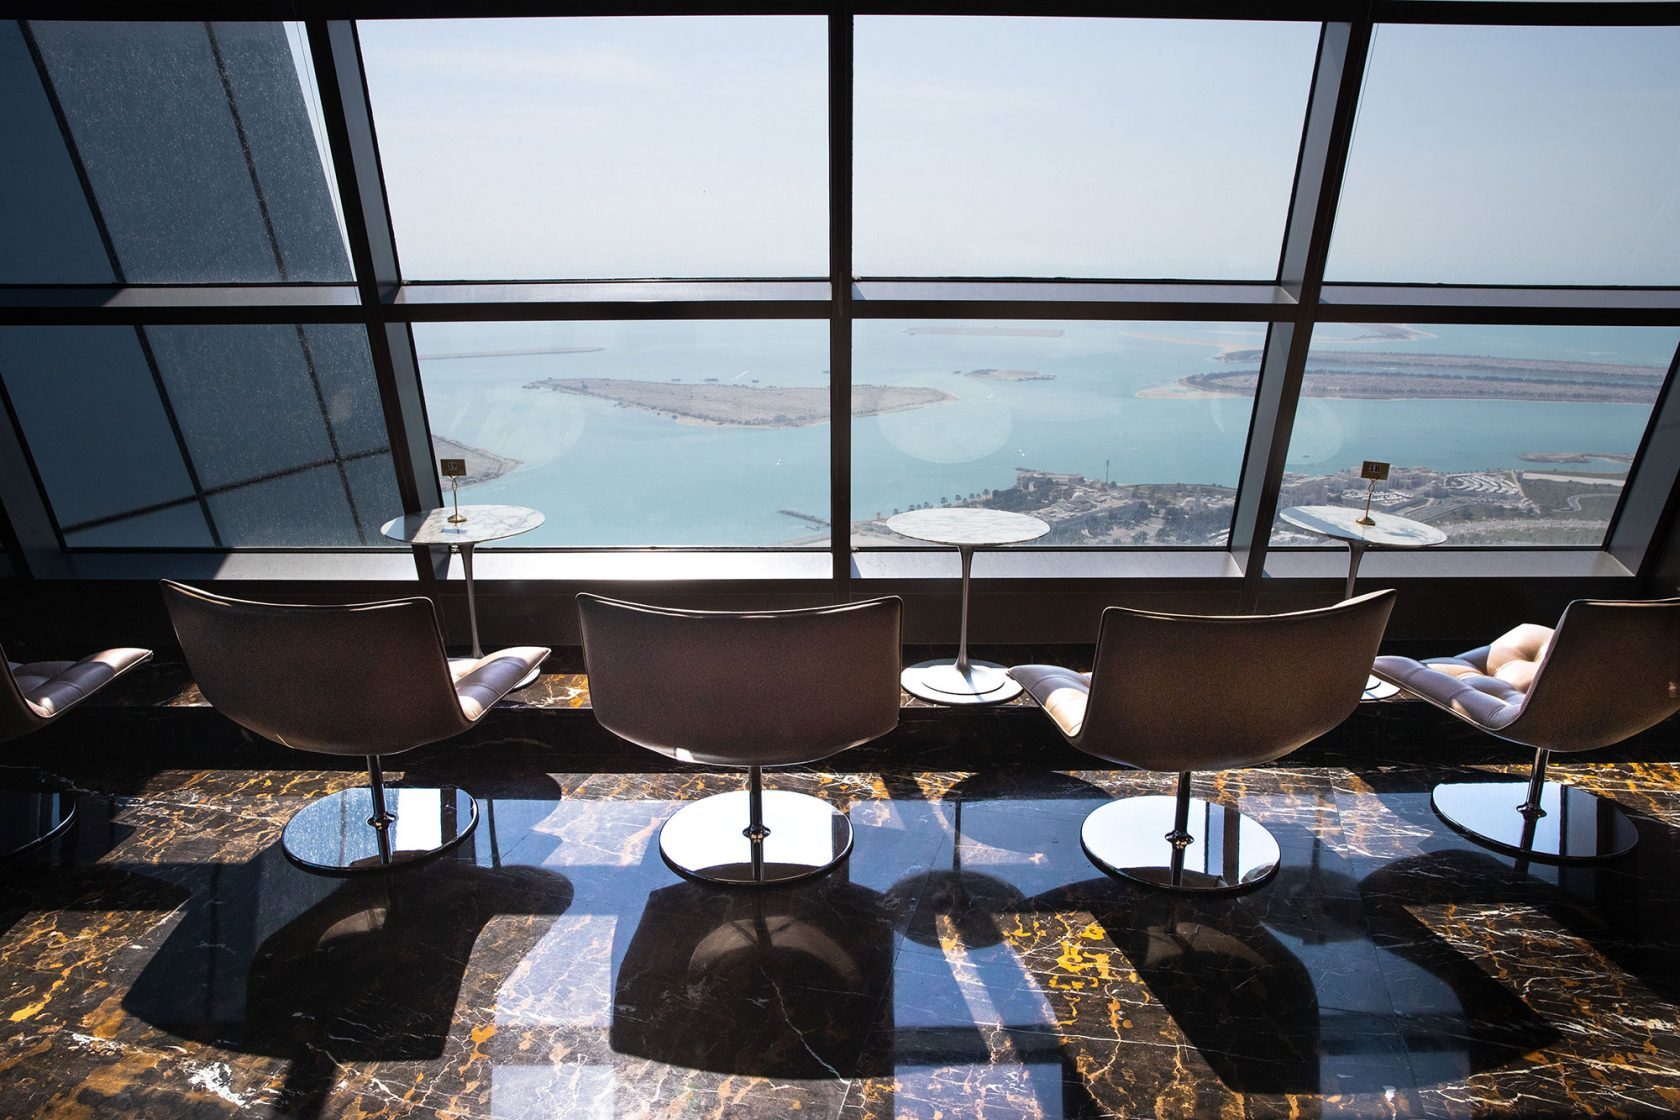 Conrad Abu Dhabi Etihad Towers Observation Deck at 300